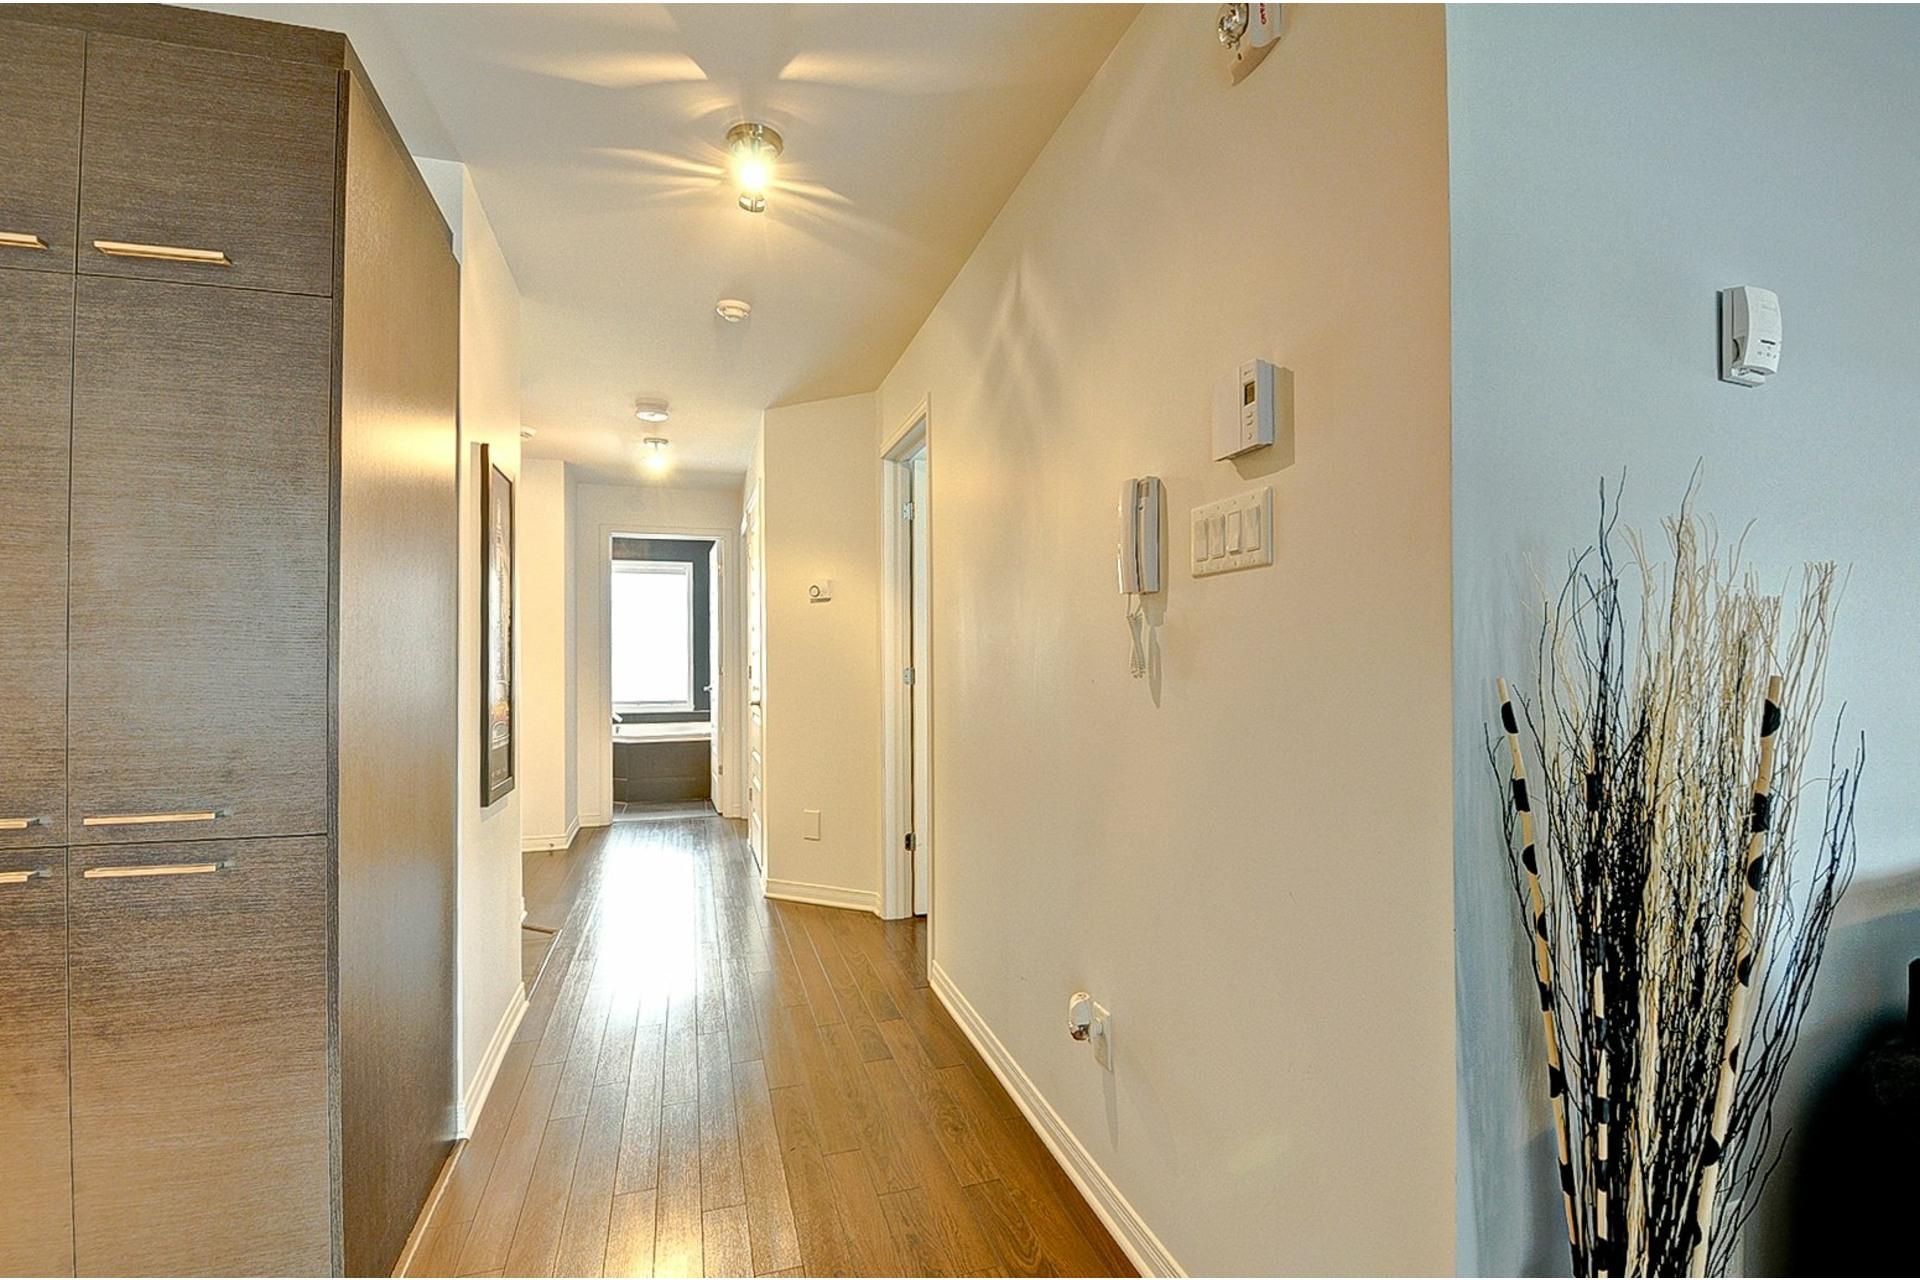 image 12 - Apartment For sale Vaudreuil-Dorion - 7 rooms